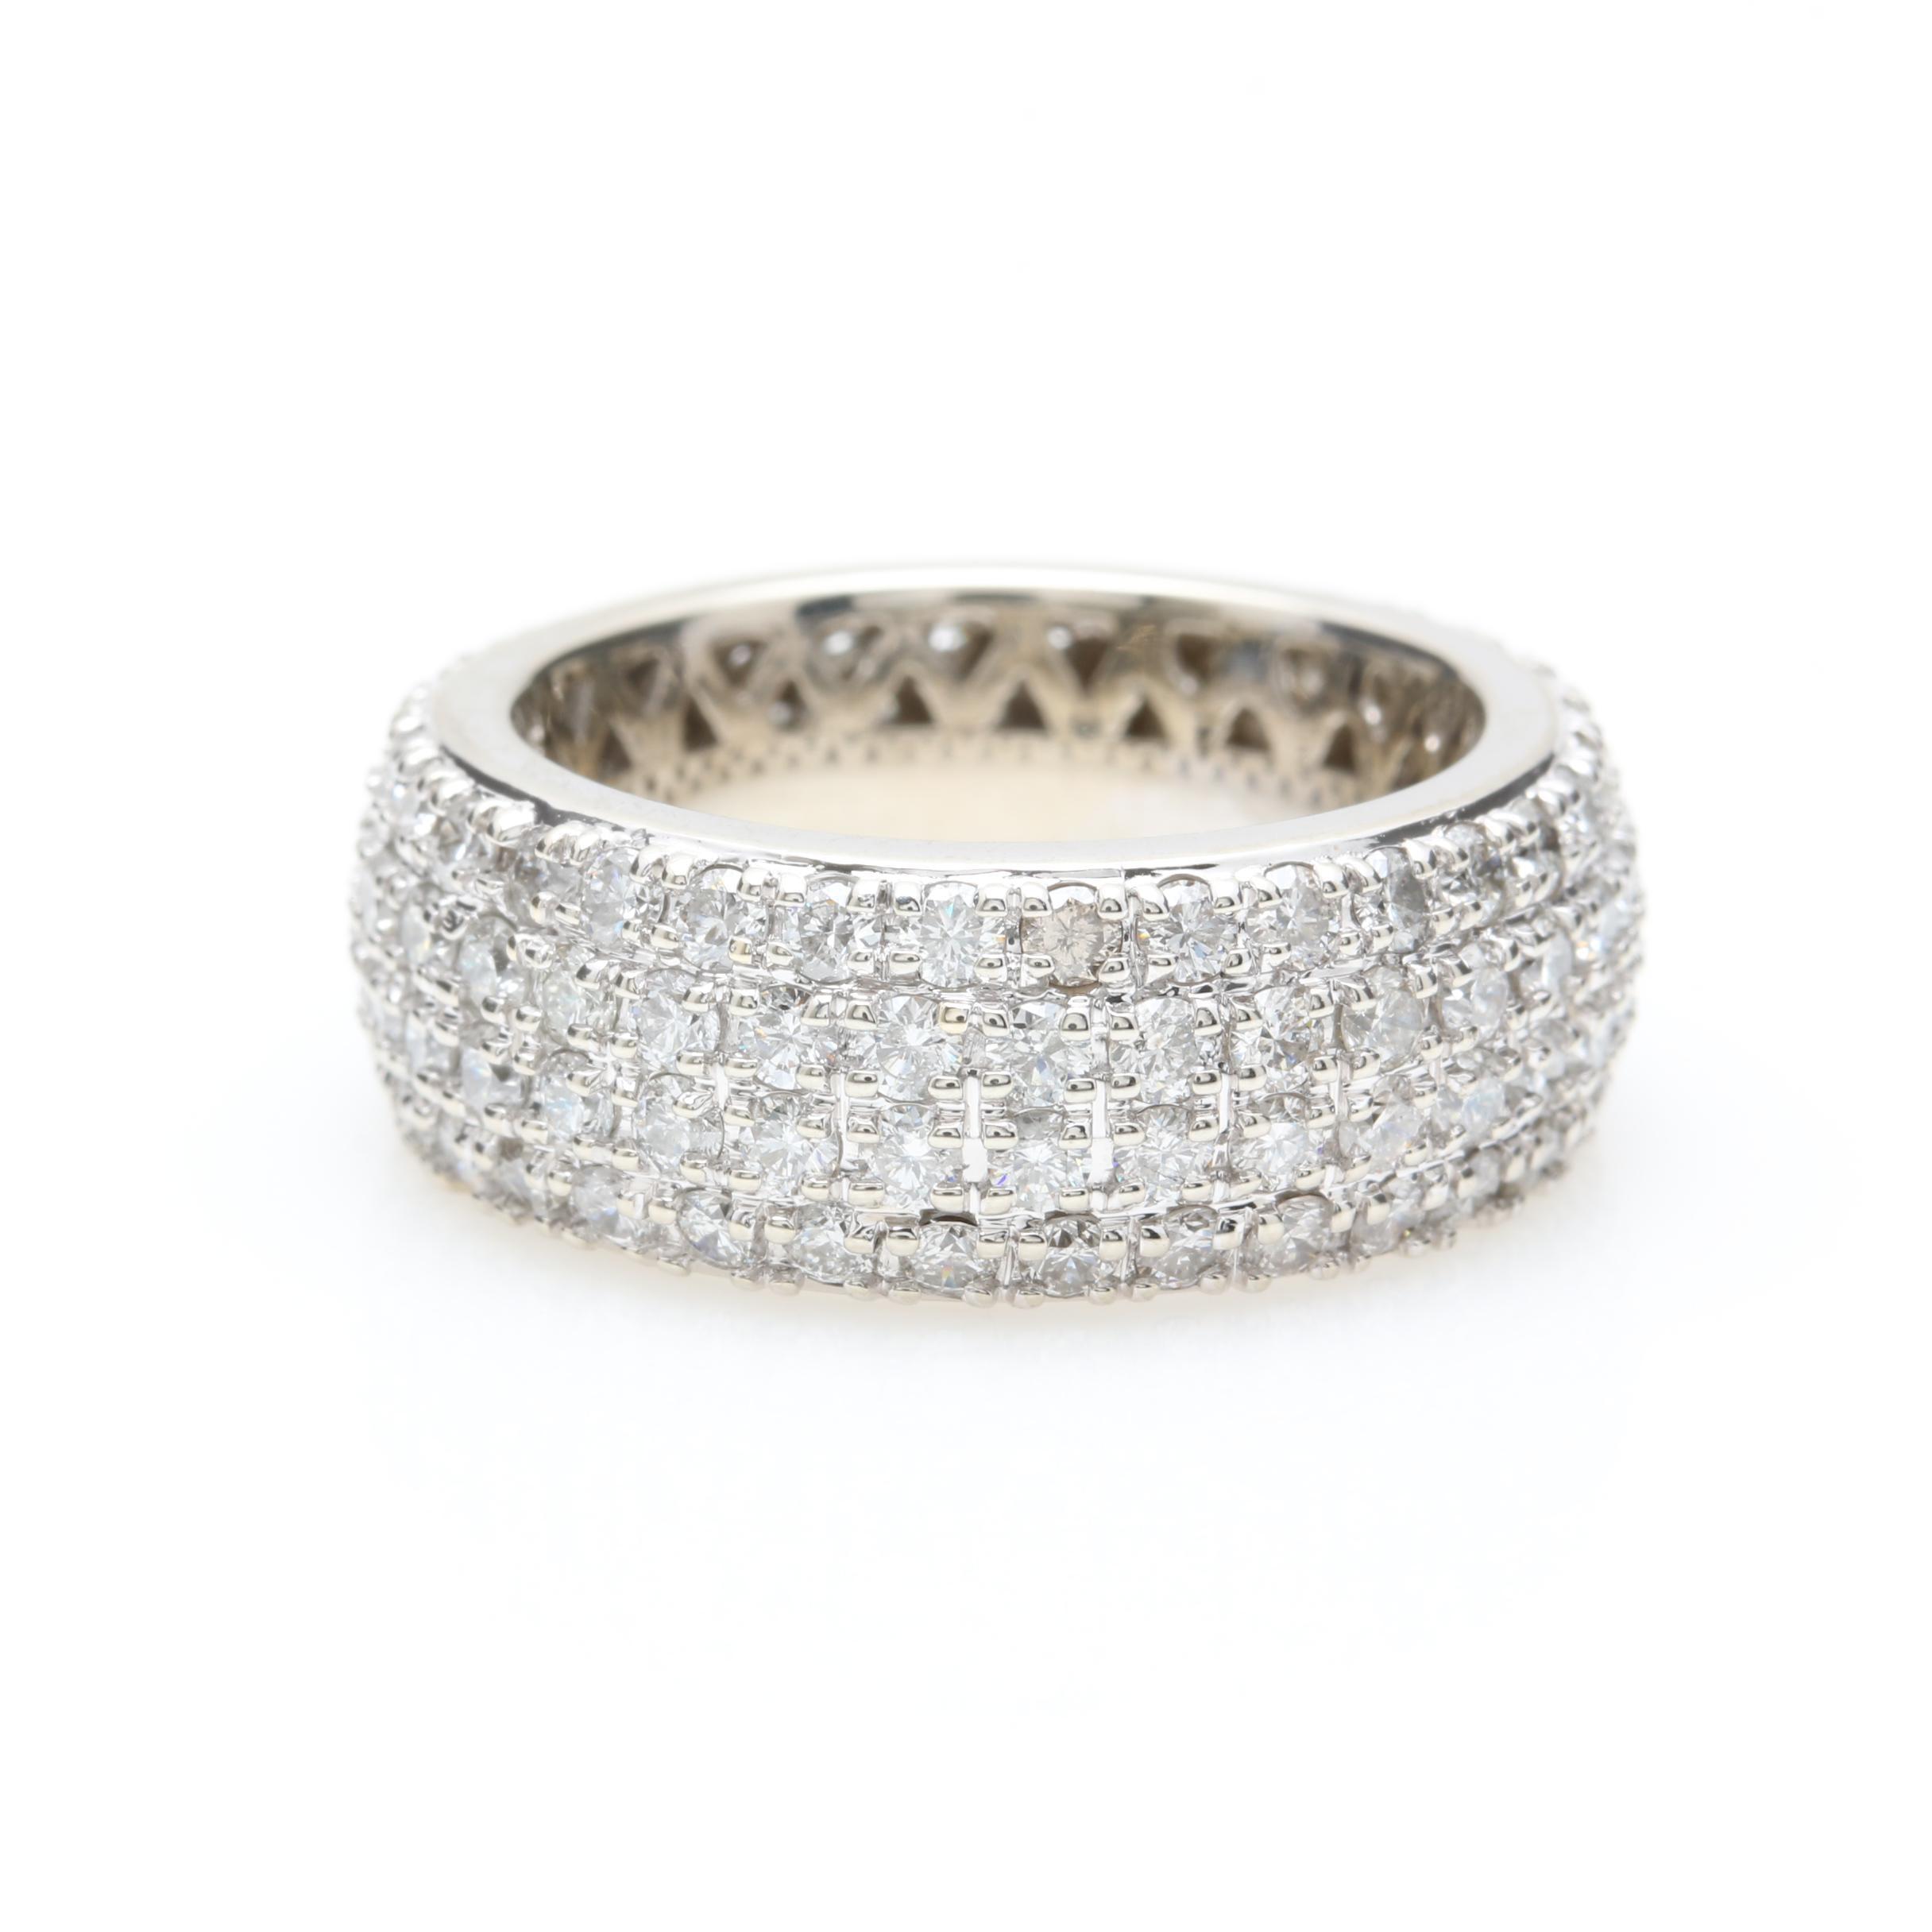 14K White Gold 3.73 CTW Diamond Eternity Band Ring